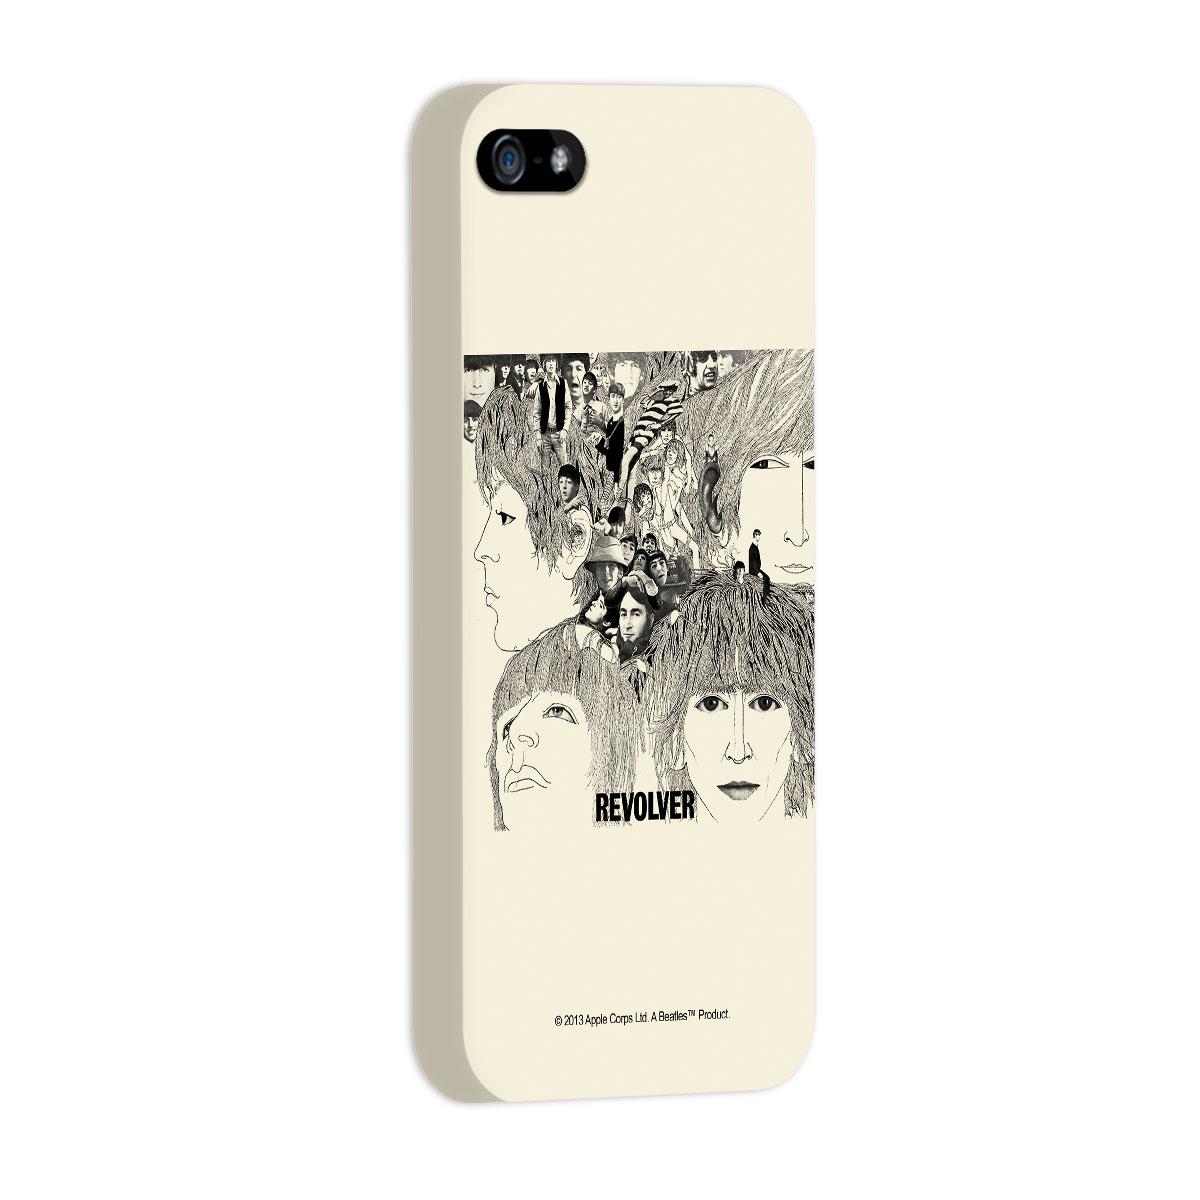 Capa de iPhone 5/5S The Beatles Revolver